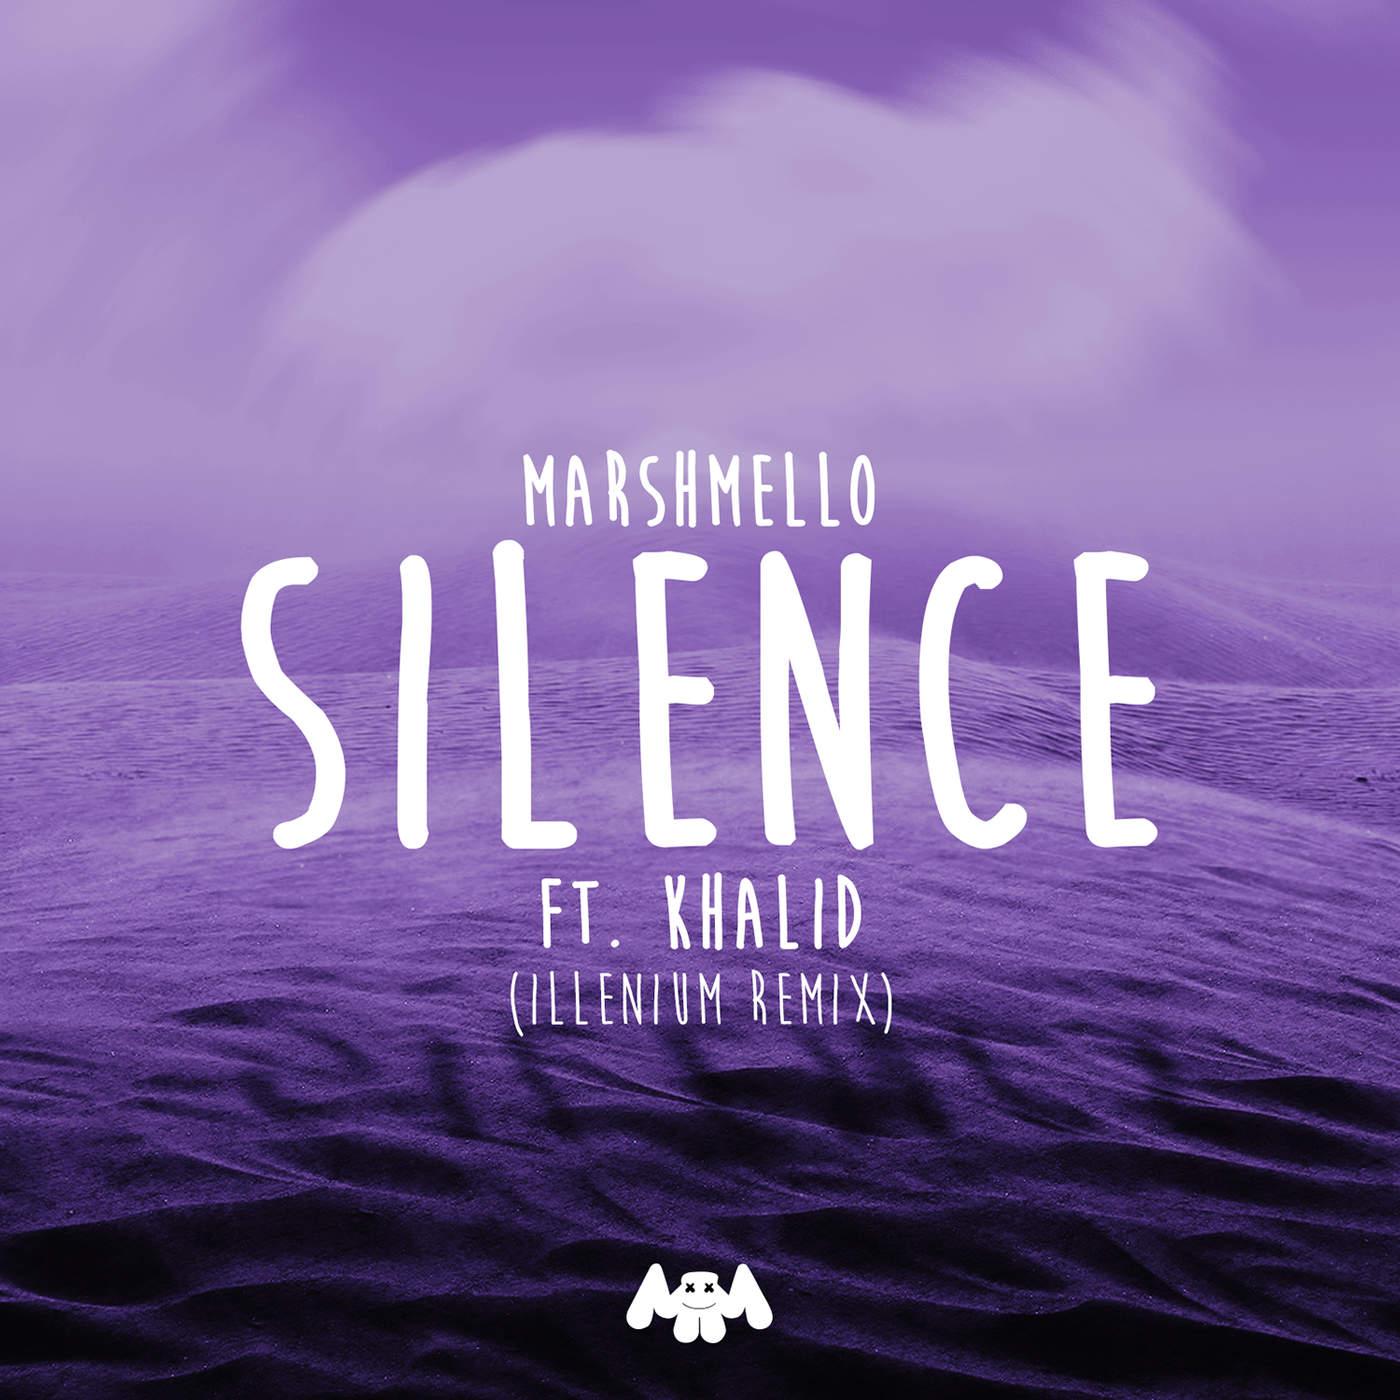 Marshmello, Khalid & Illenium - Silence (Illenium Remix) - Single